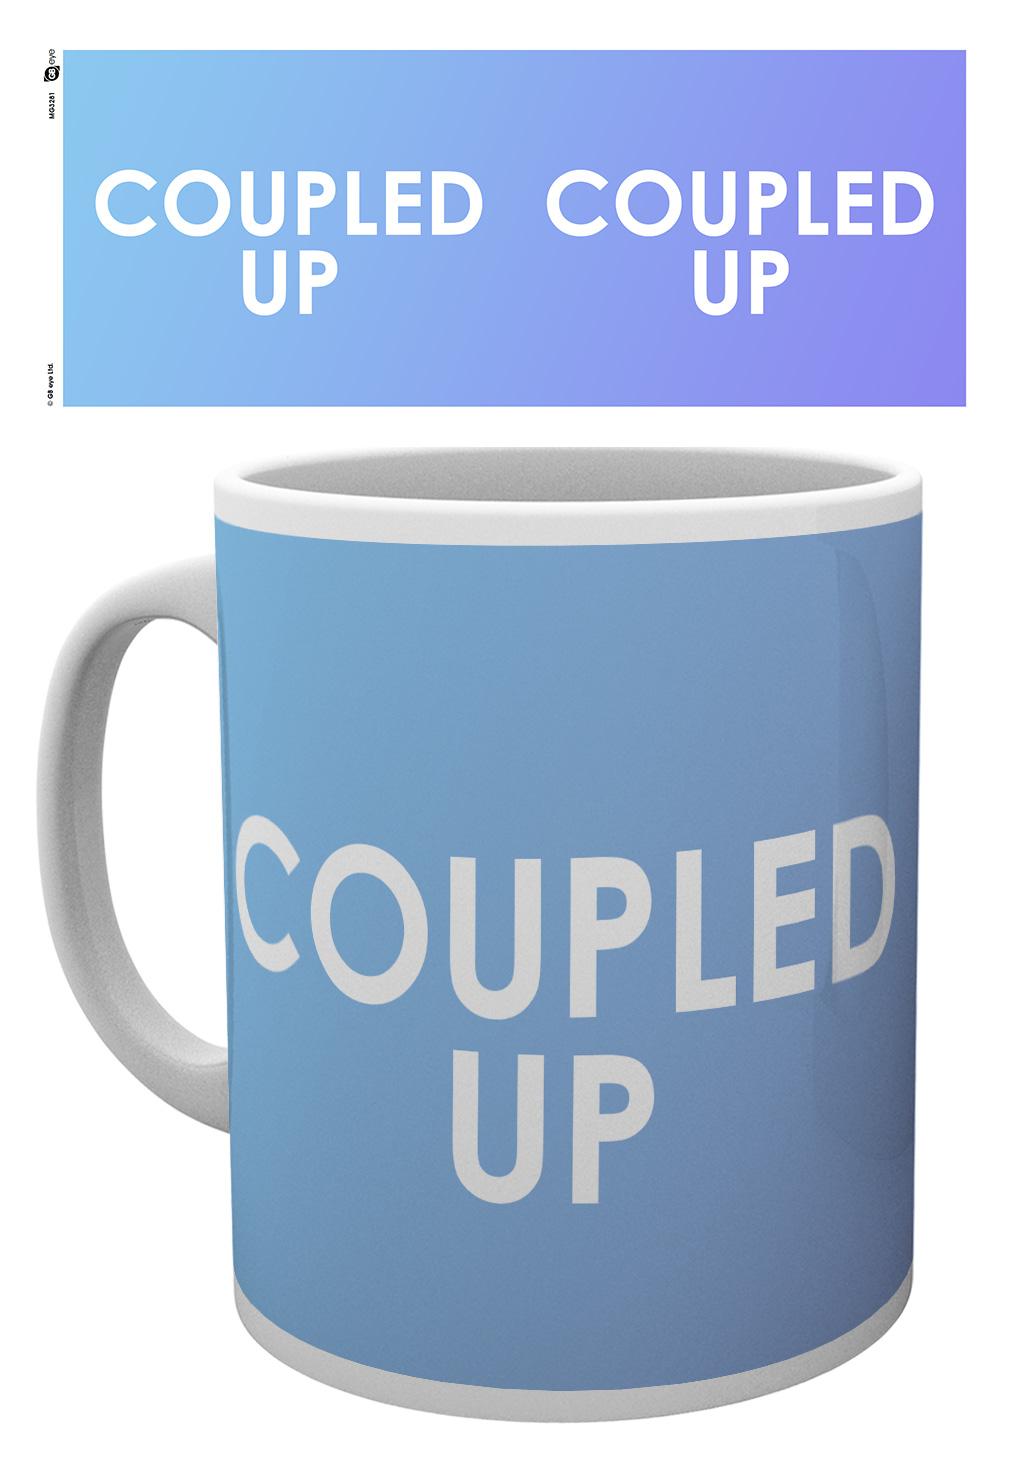 say what mug